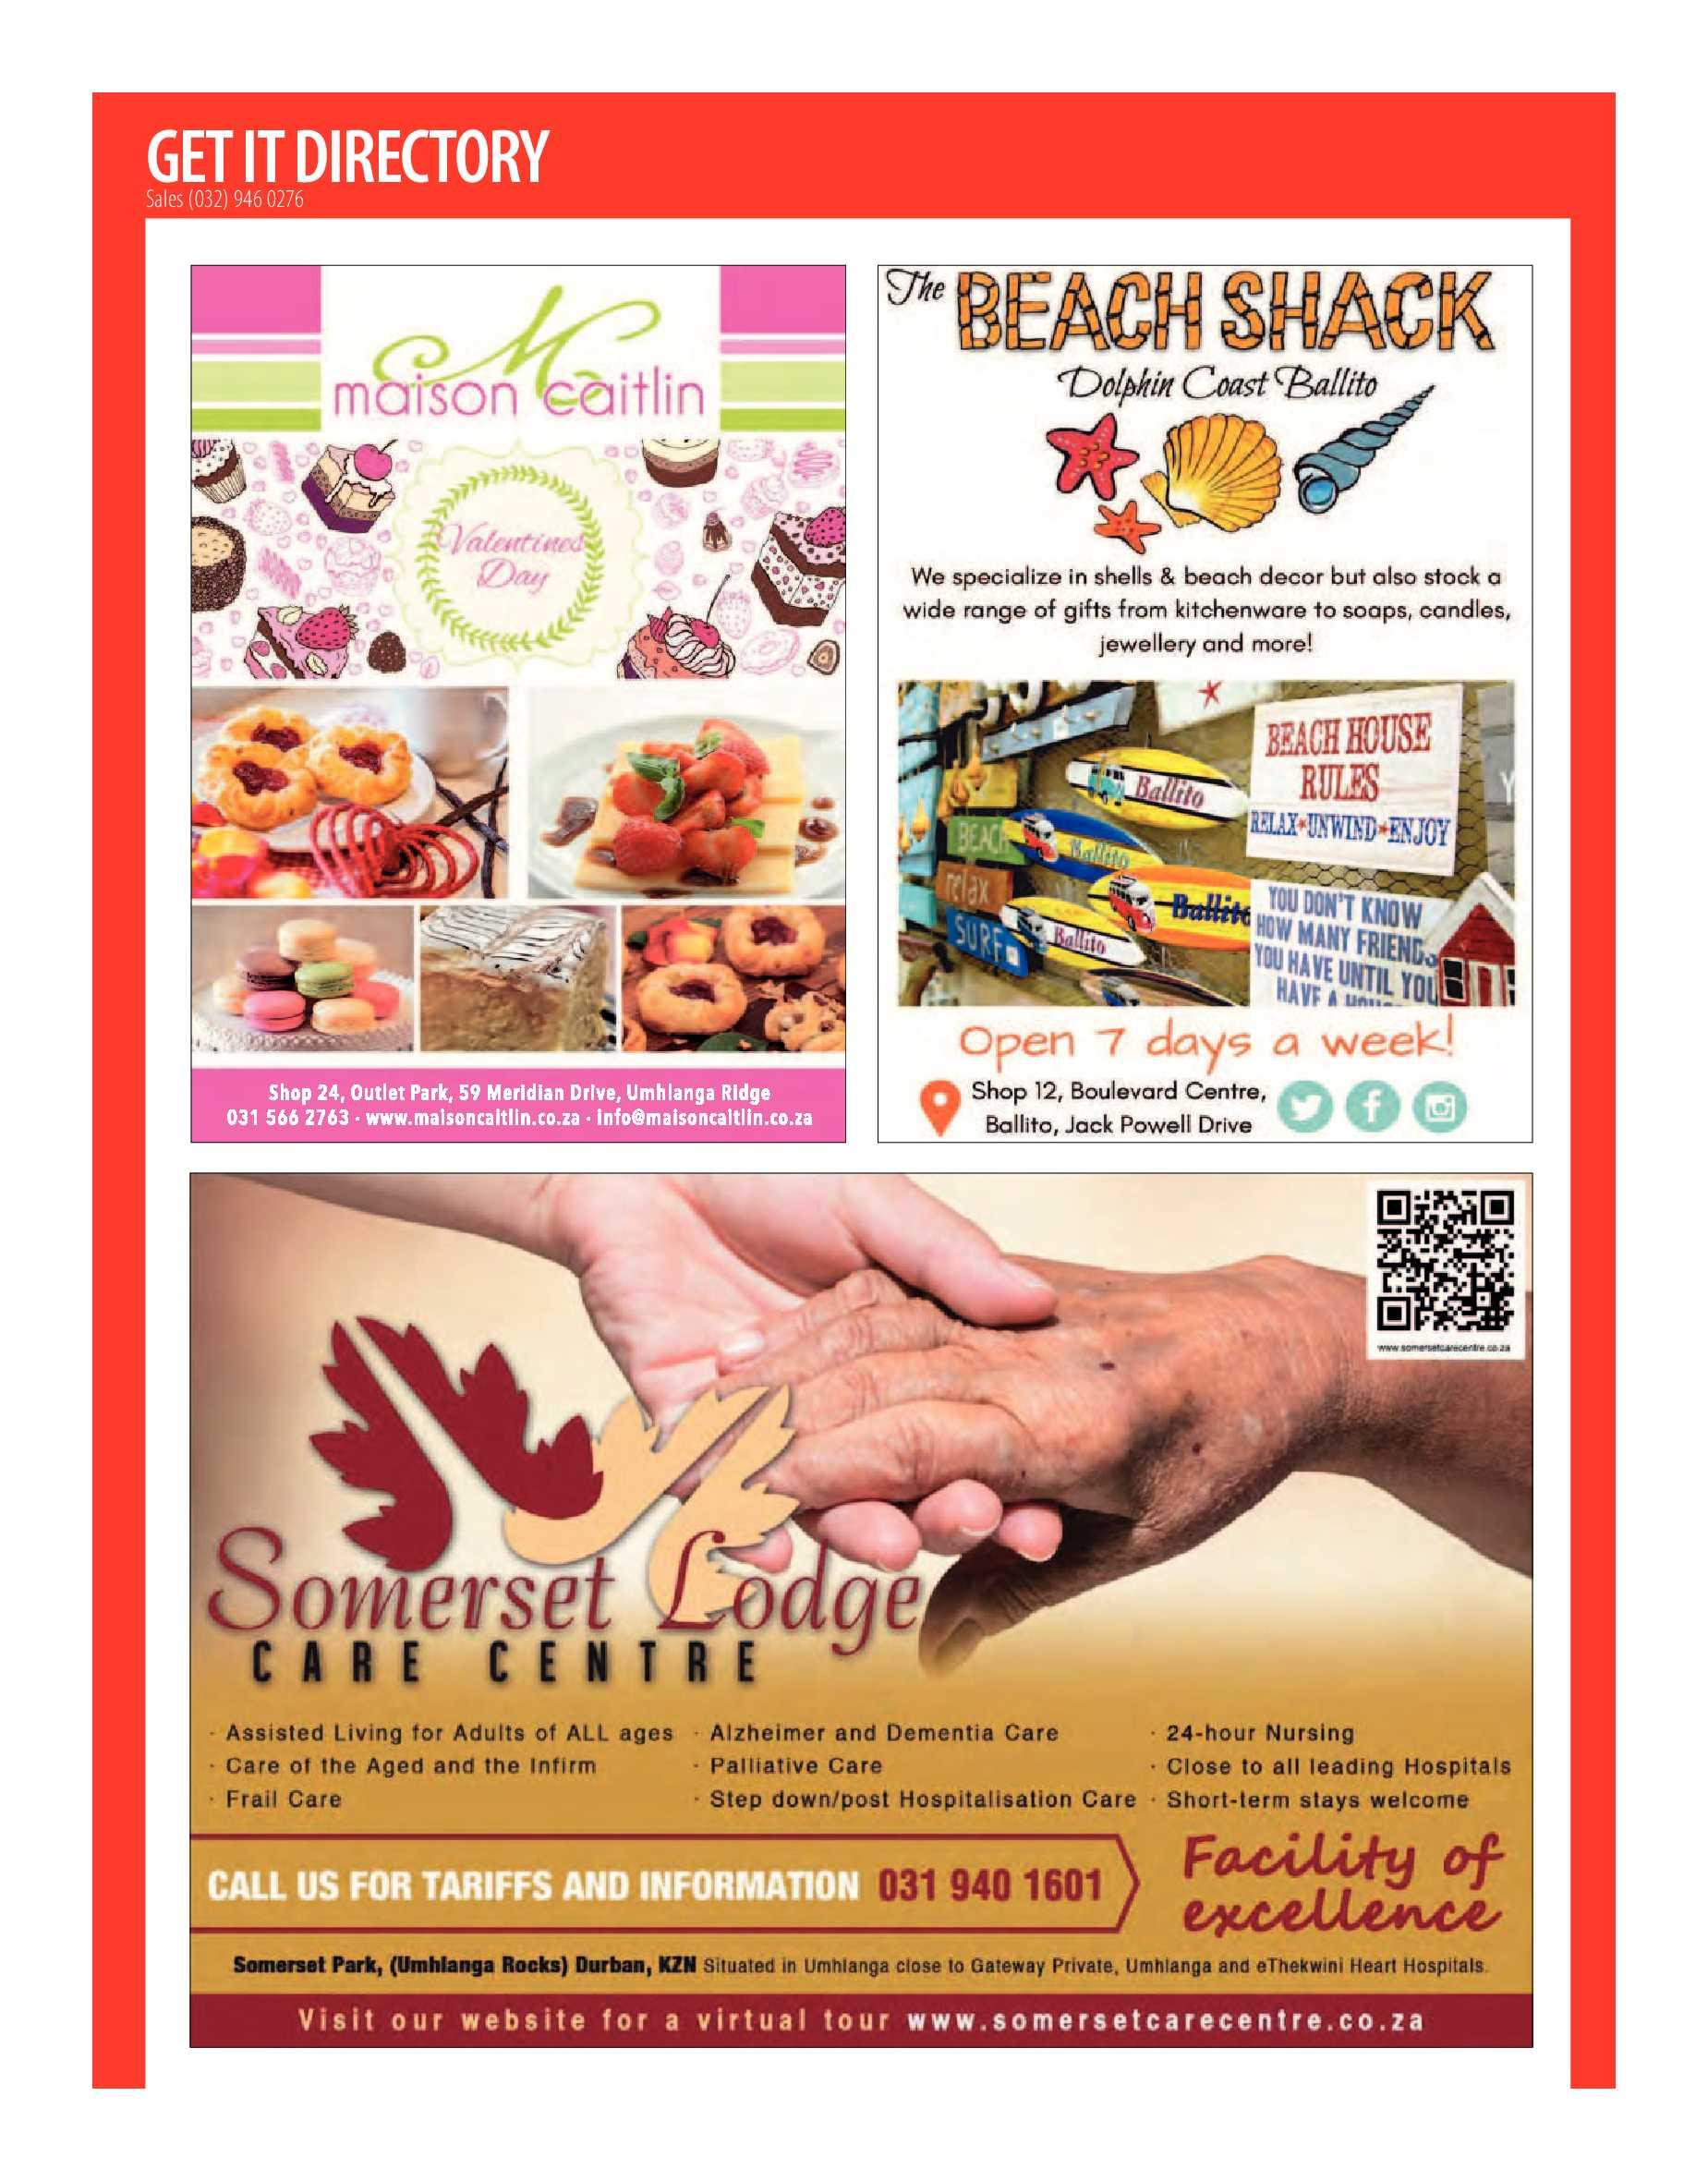 get-it-magazine-ballitoumhlanga-february-2017-epapers-page-46